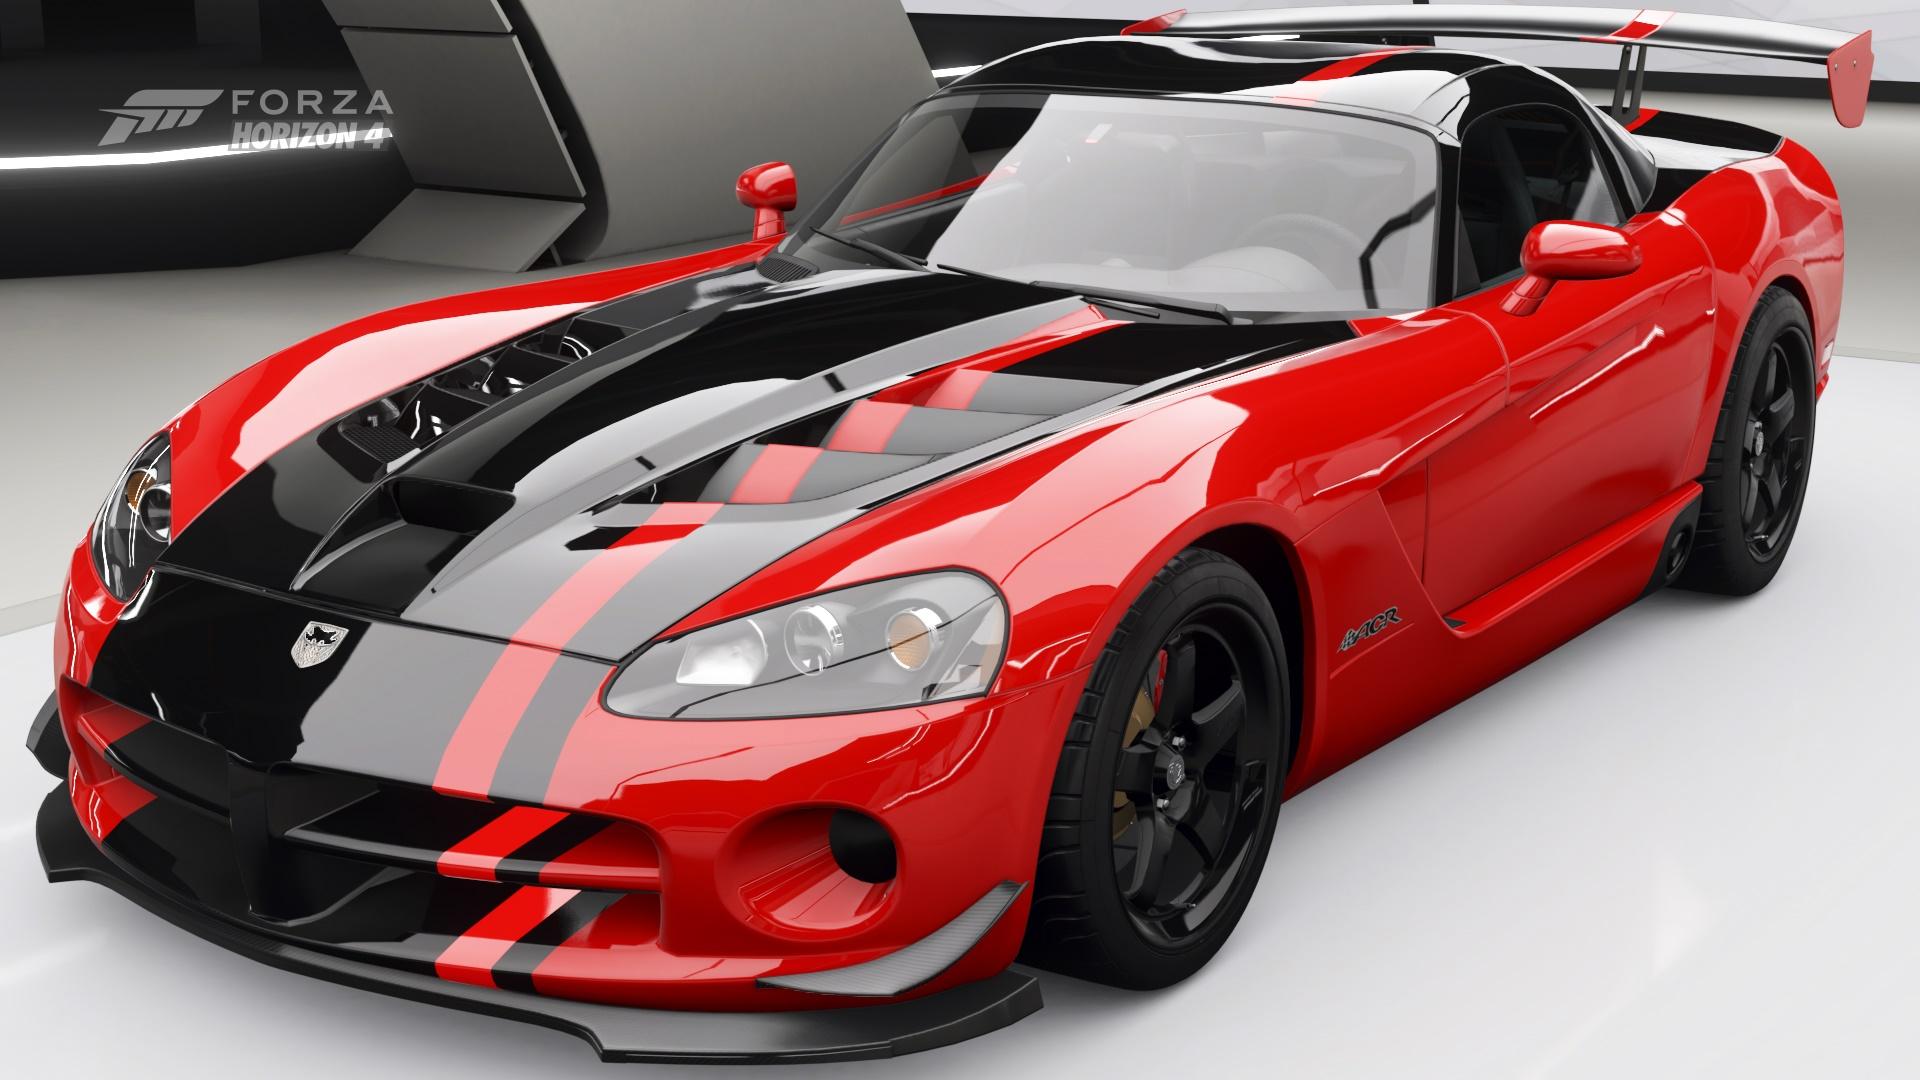 Dodge Viper SRT10 ACR | Forza Motorsport Wiki | FANDOM powered by Wikia